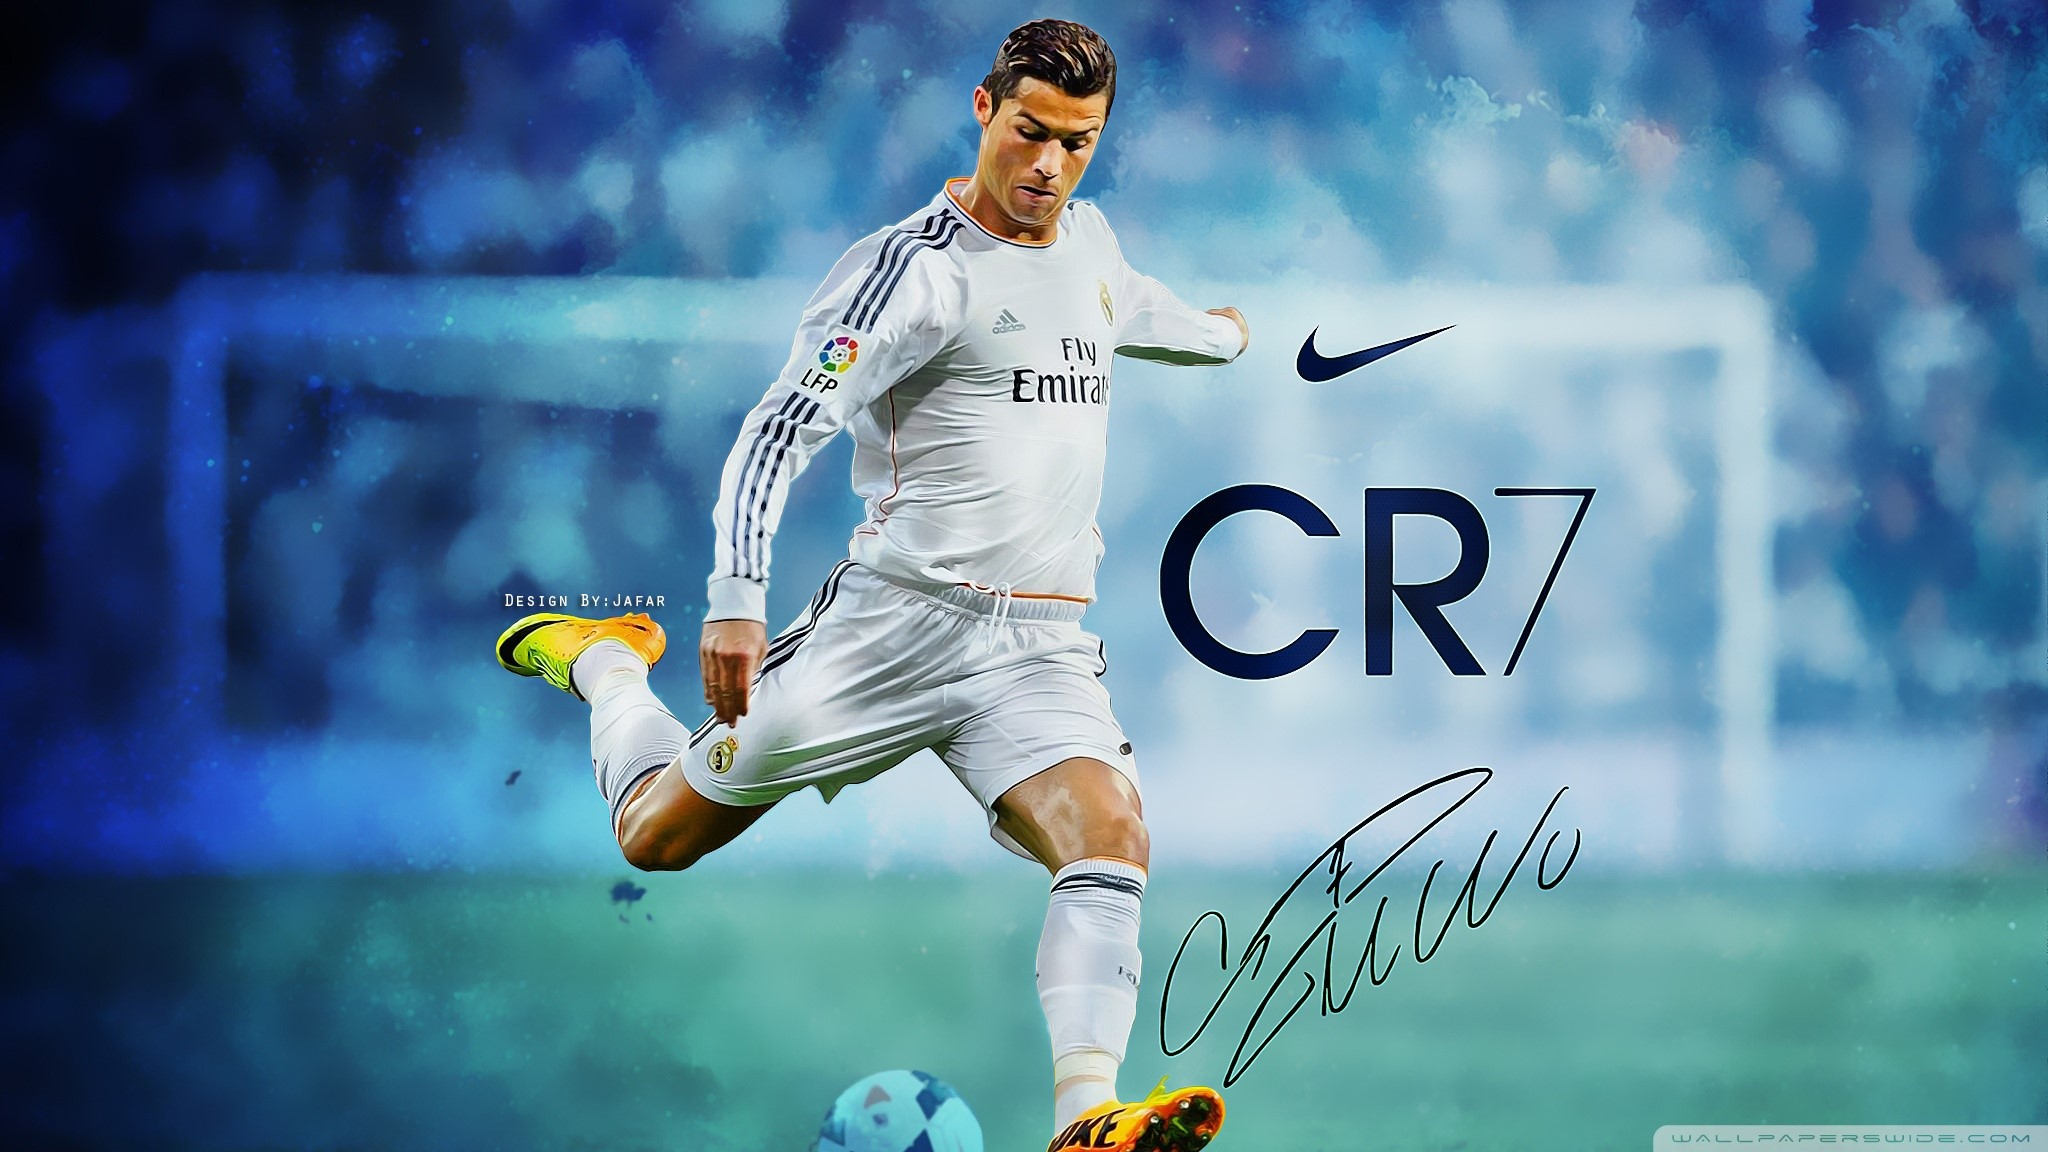 Cristiano Ronaldo Desktop Wallpapers